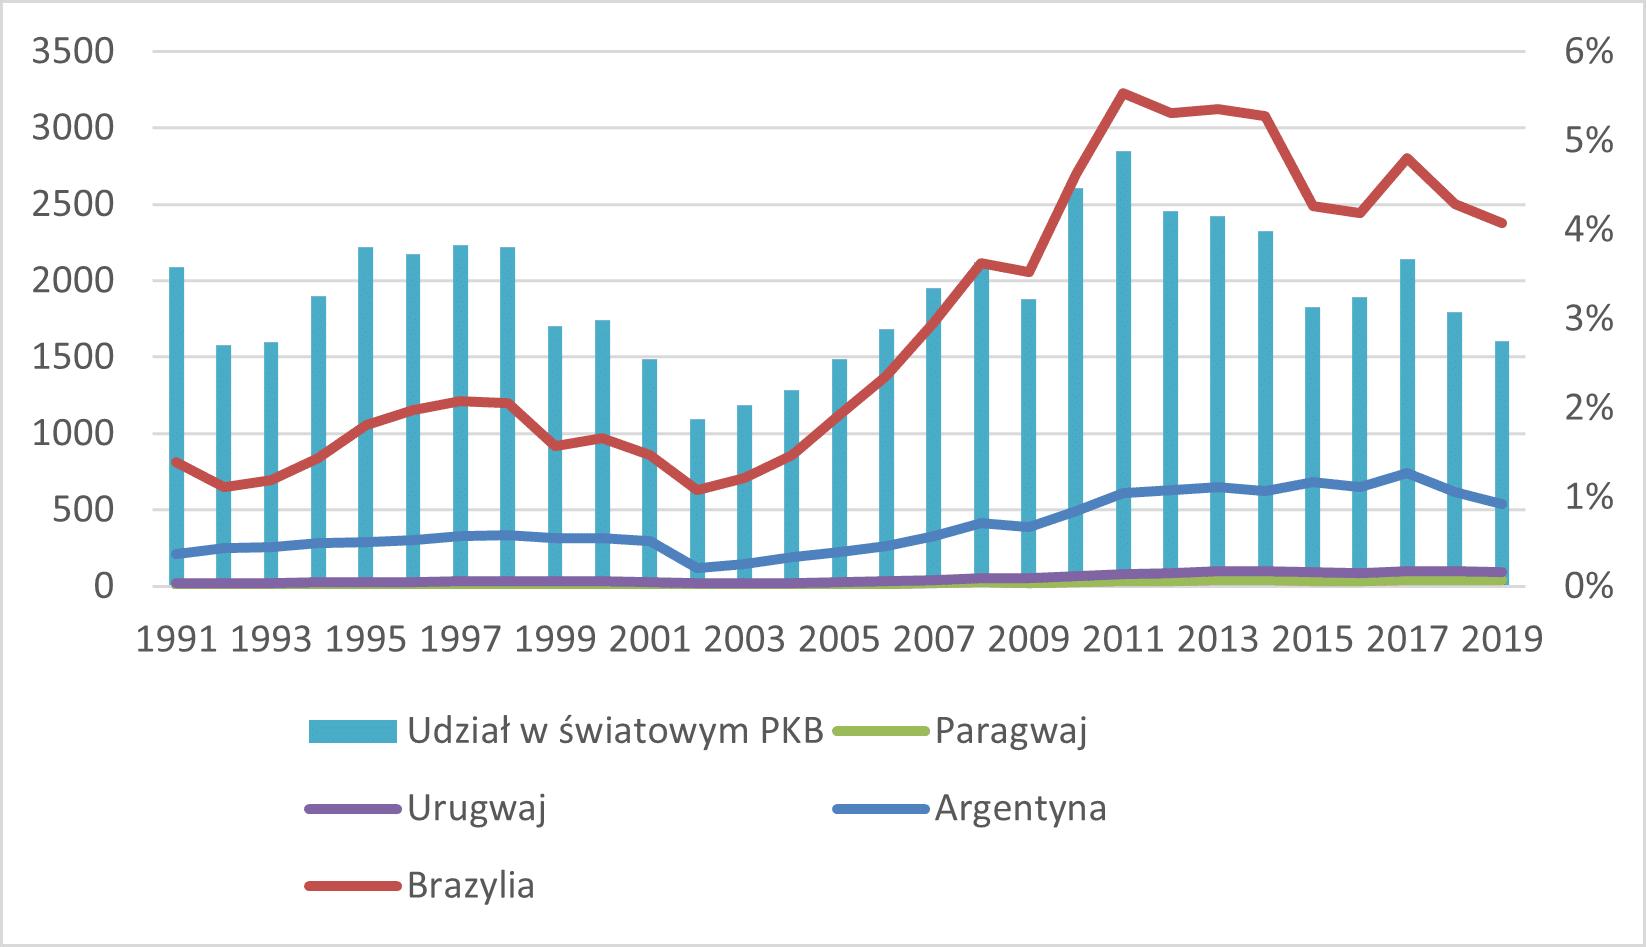 Skumulowane nominalne PKB